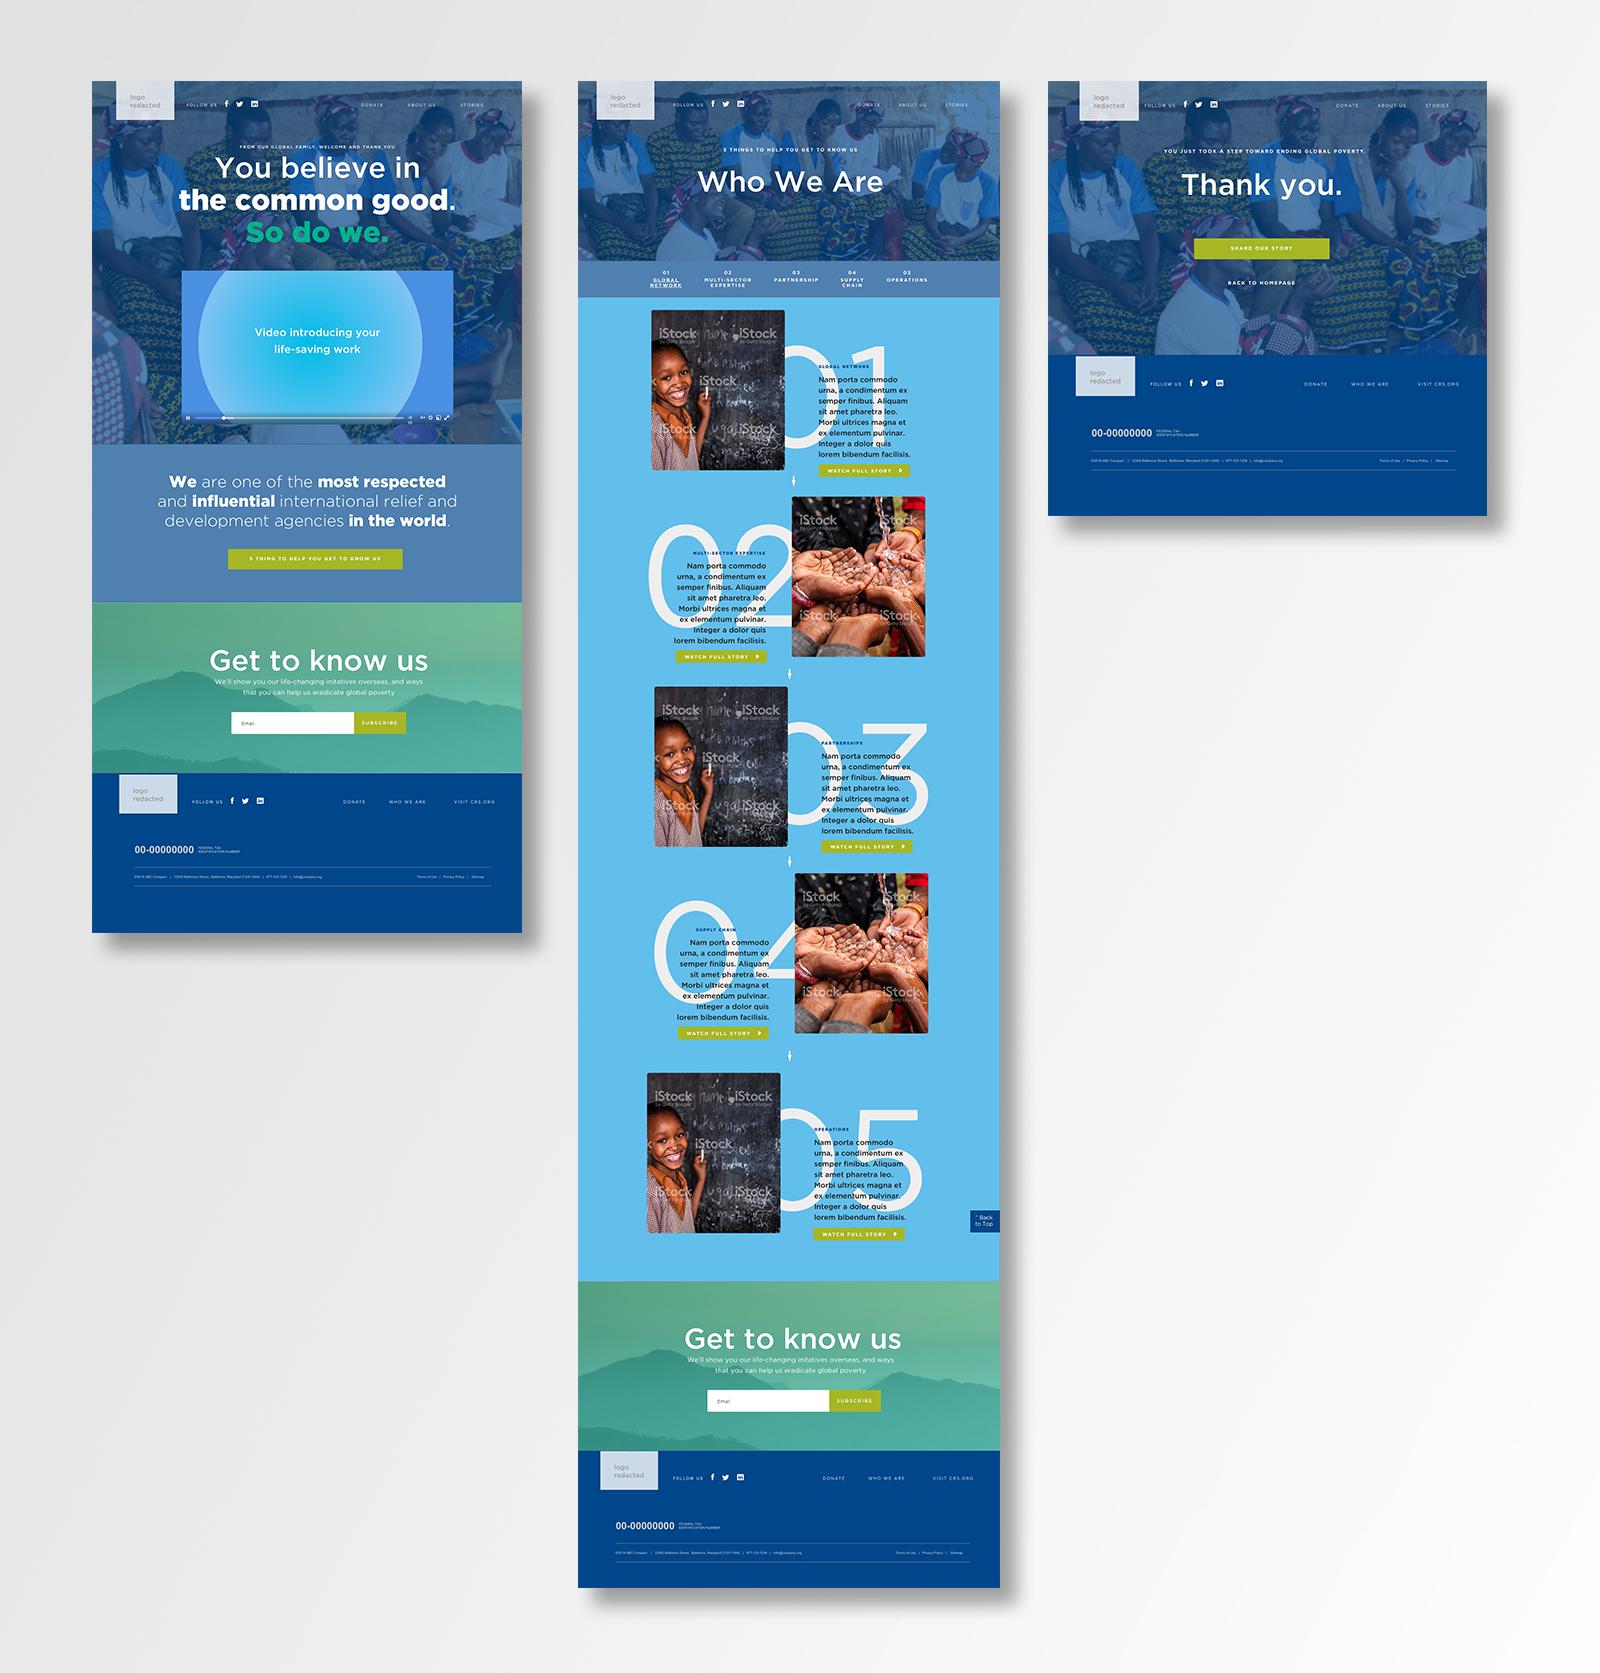 ngo-nonprofit-website-design-ux-ui.png